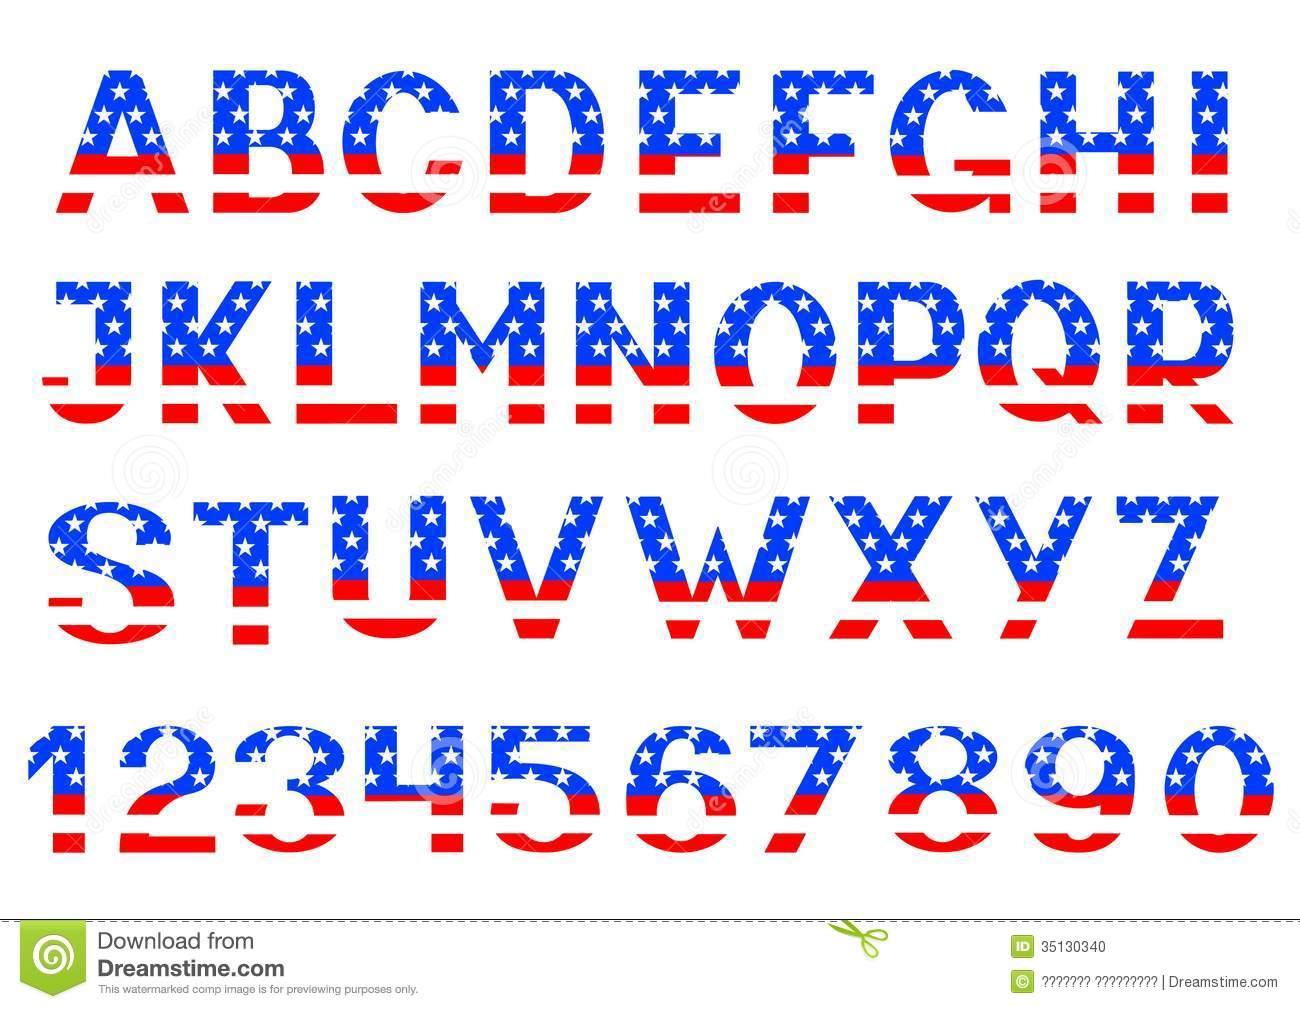 Flag alphabet letters clipart black and white library Alphabet letter clipart flags - ClipartFest black and white library